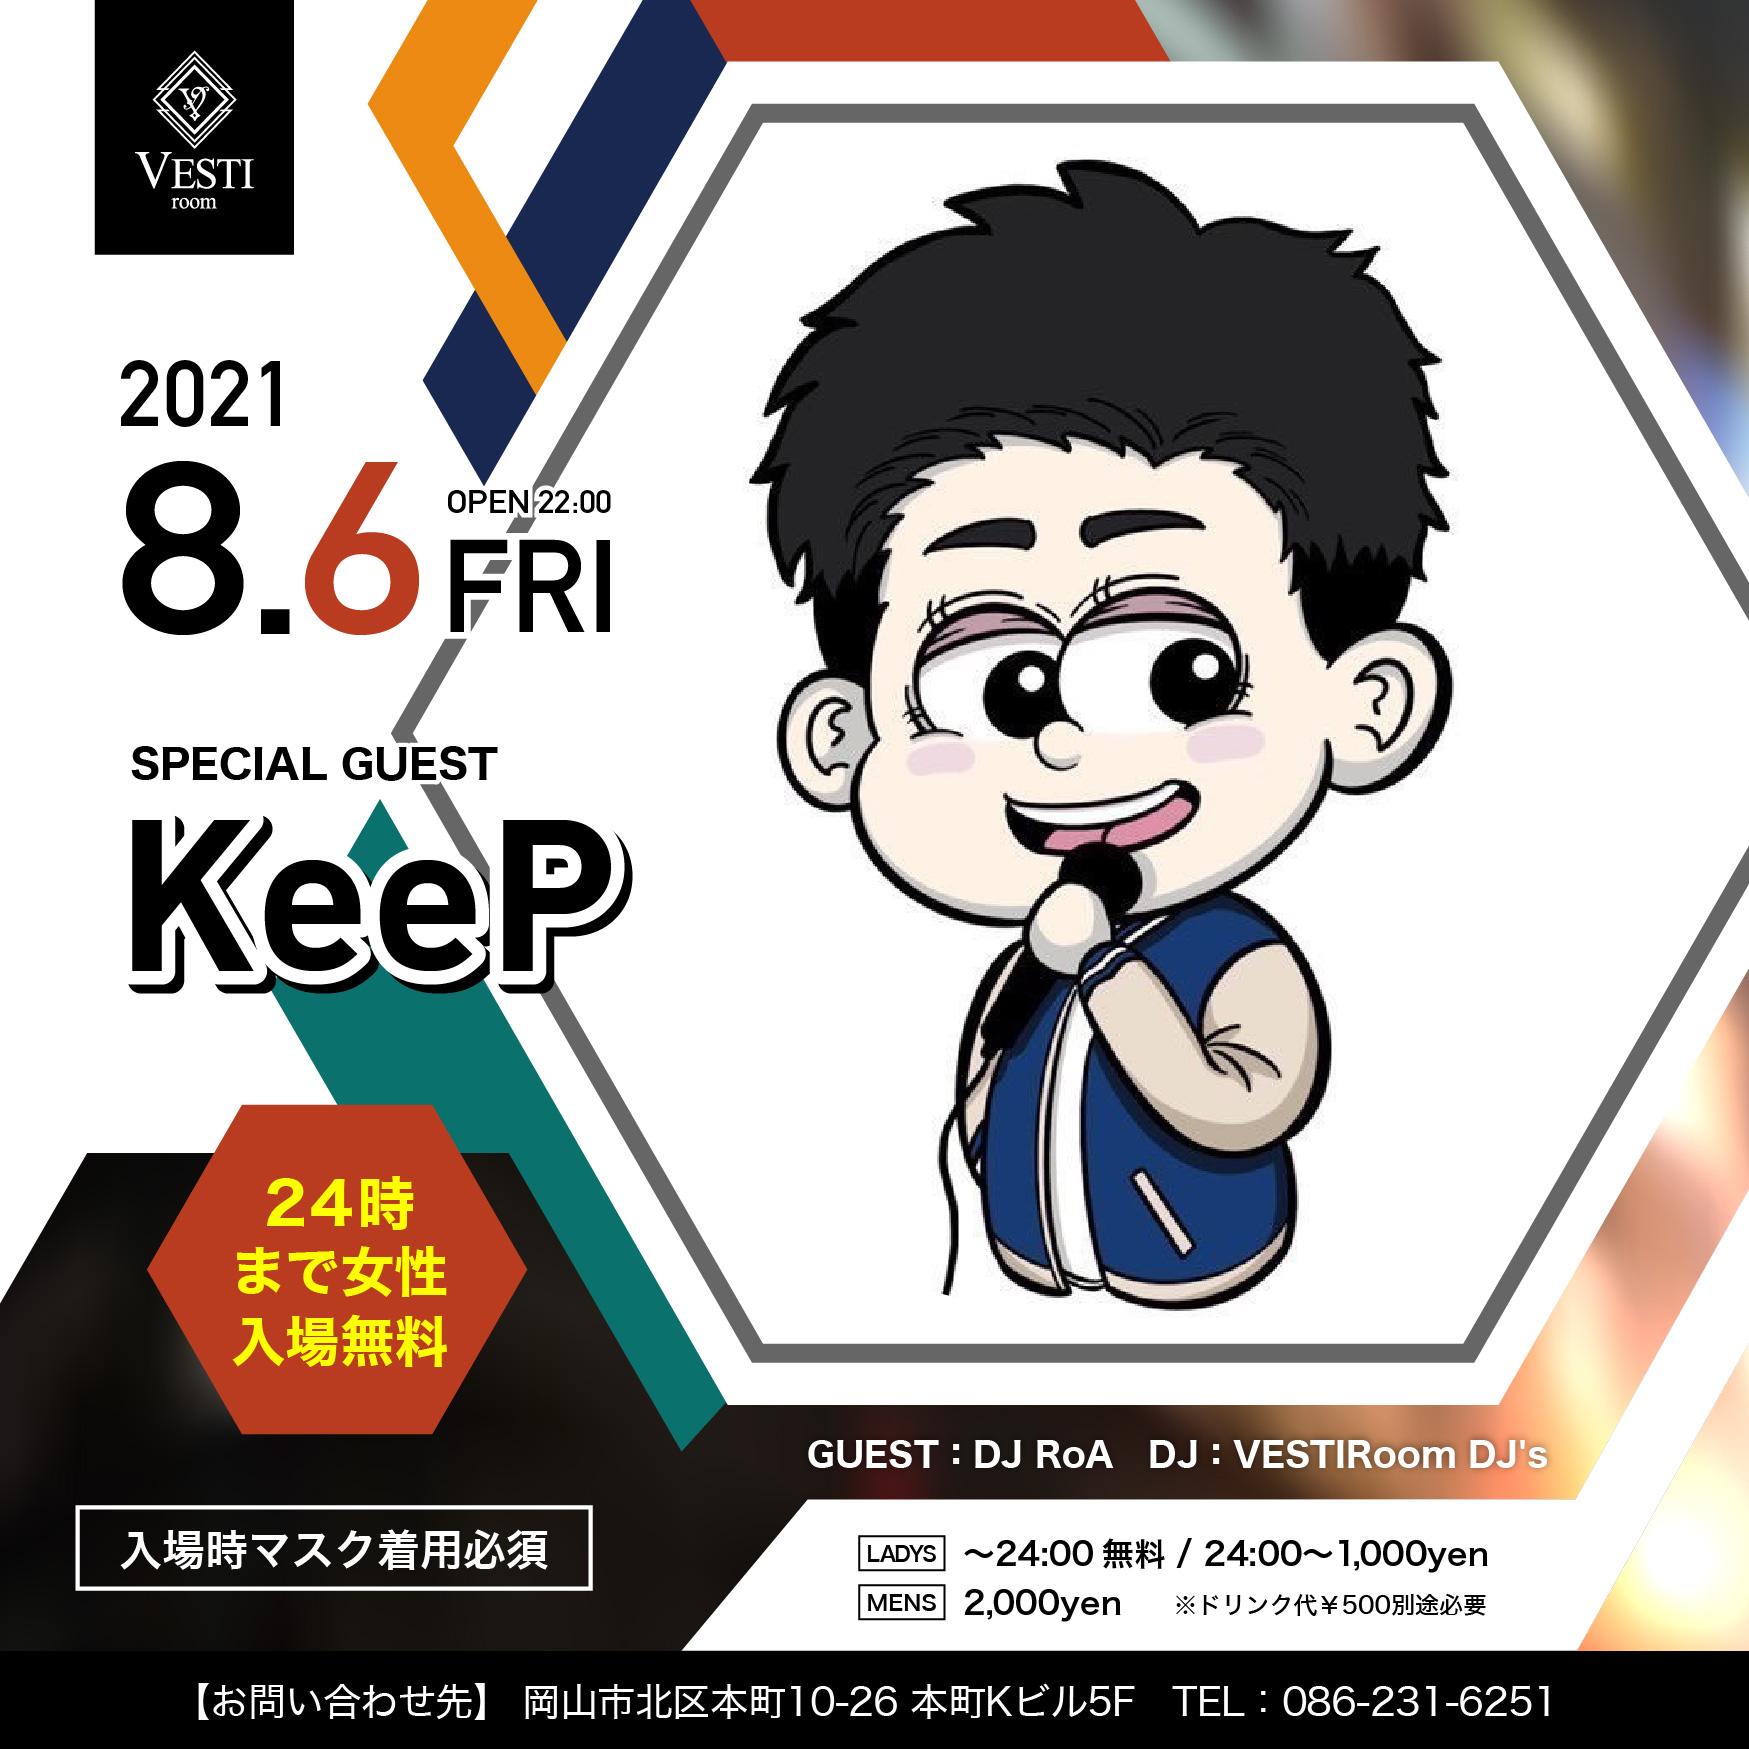 Special Guest : KeeP 24時まで女性入場無料